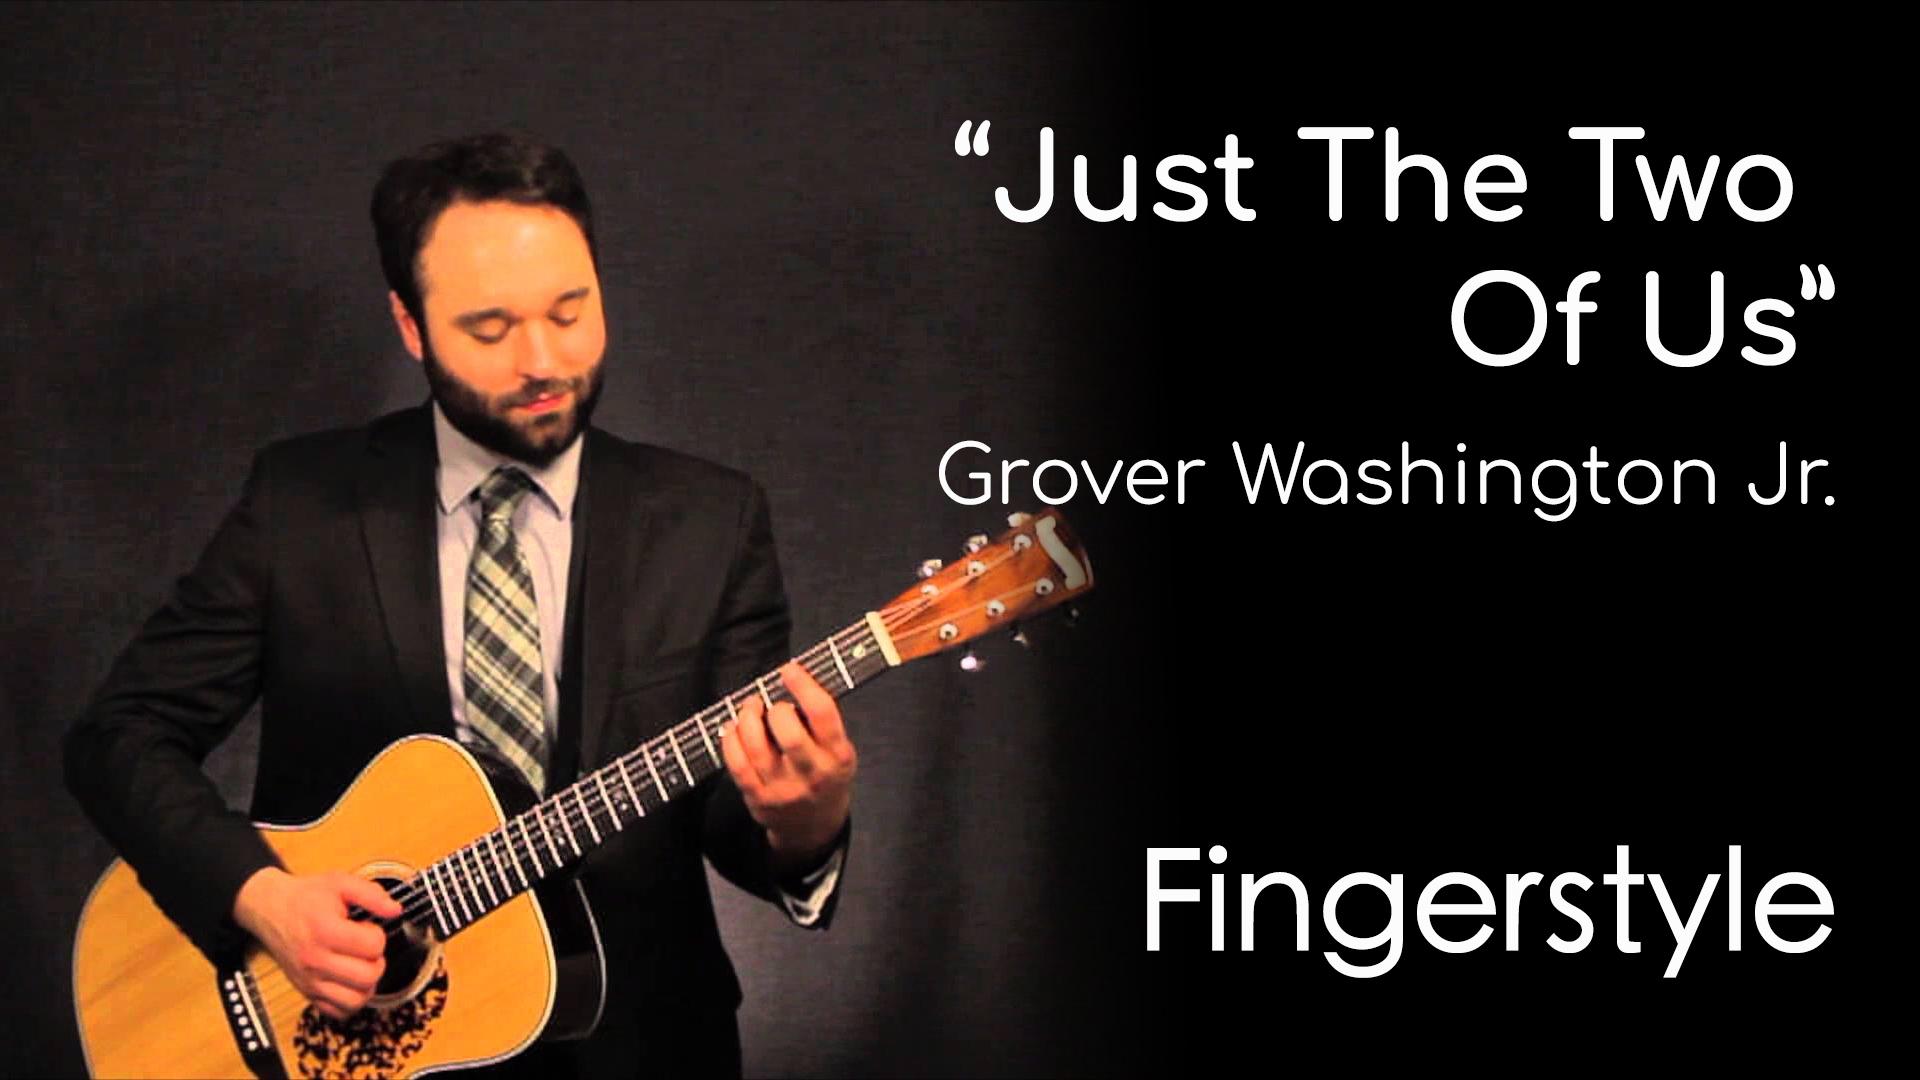 Just The Two Of Us Grover Washington Jr Garret Schmittling